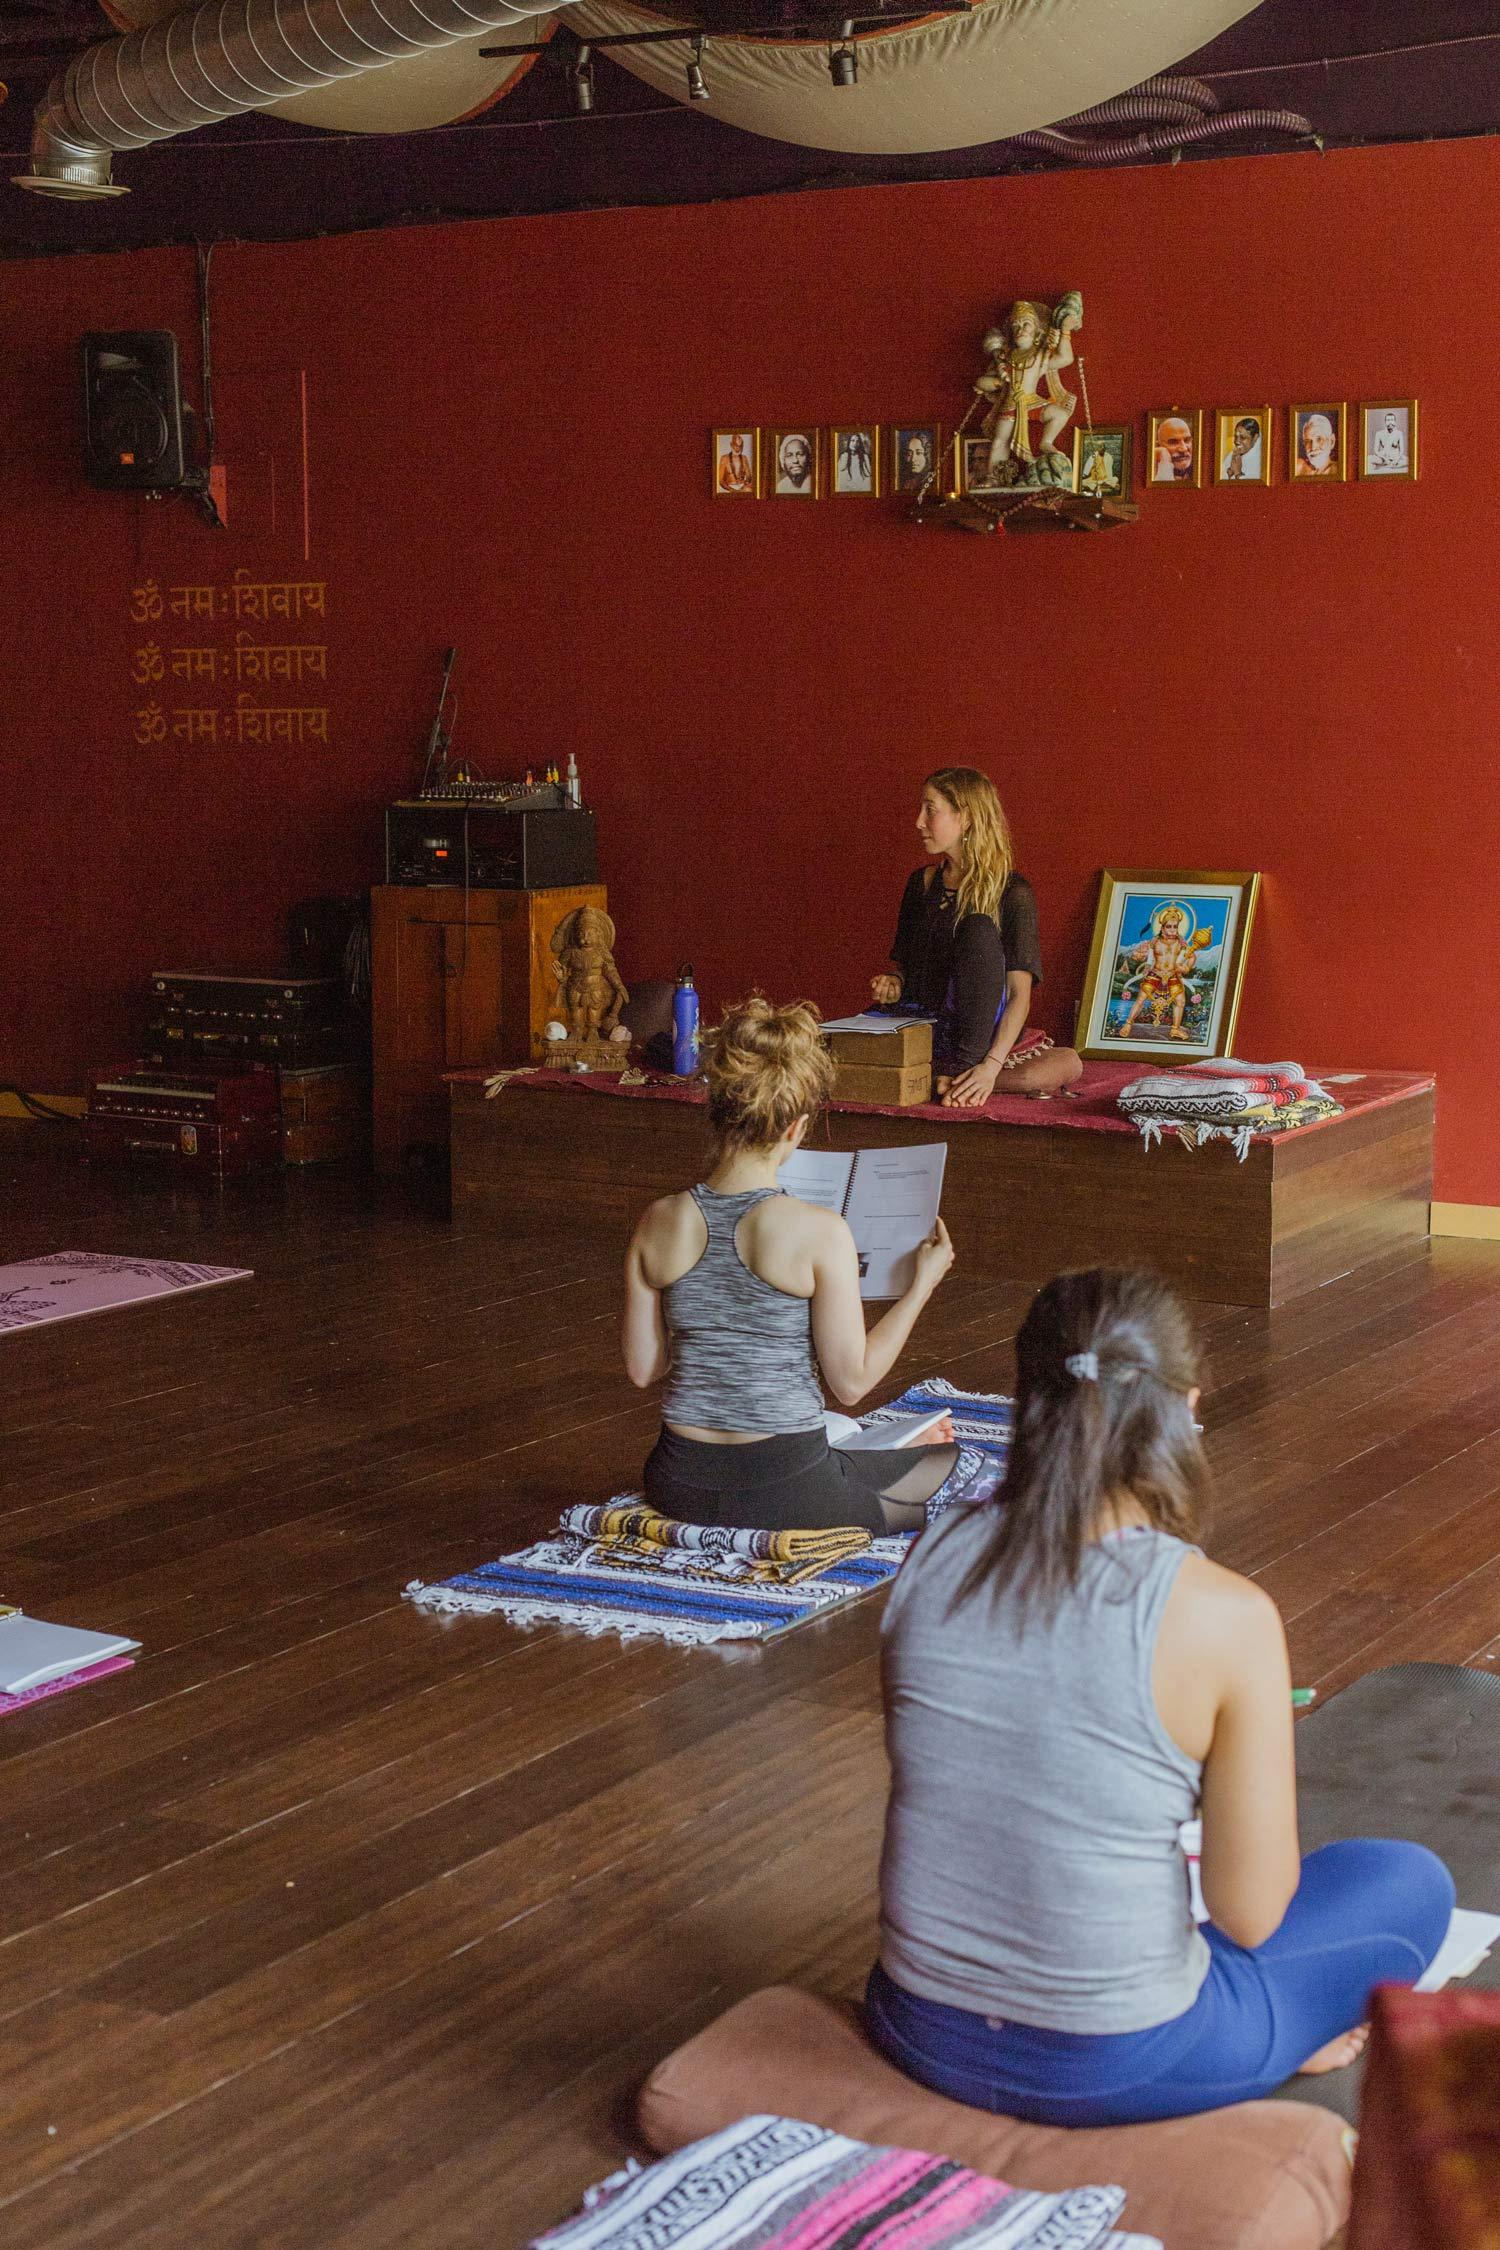 bhakti-2018-yin-yoga-teacher-training-10.jpg